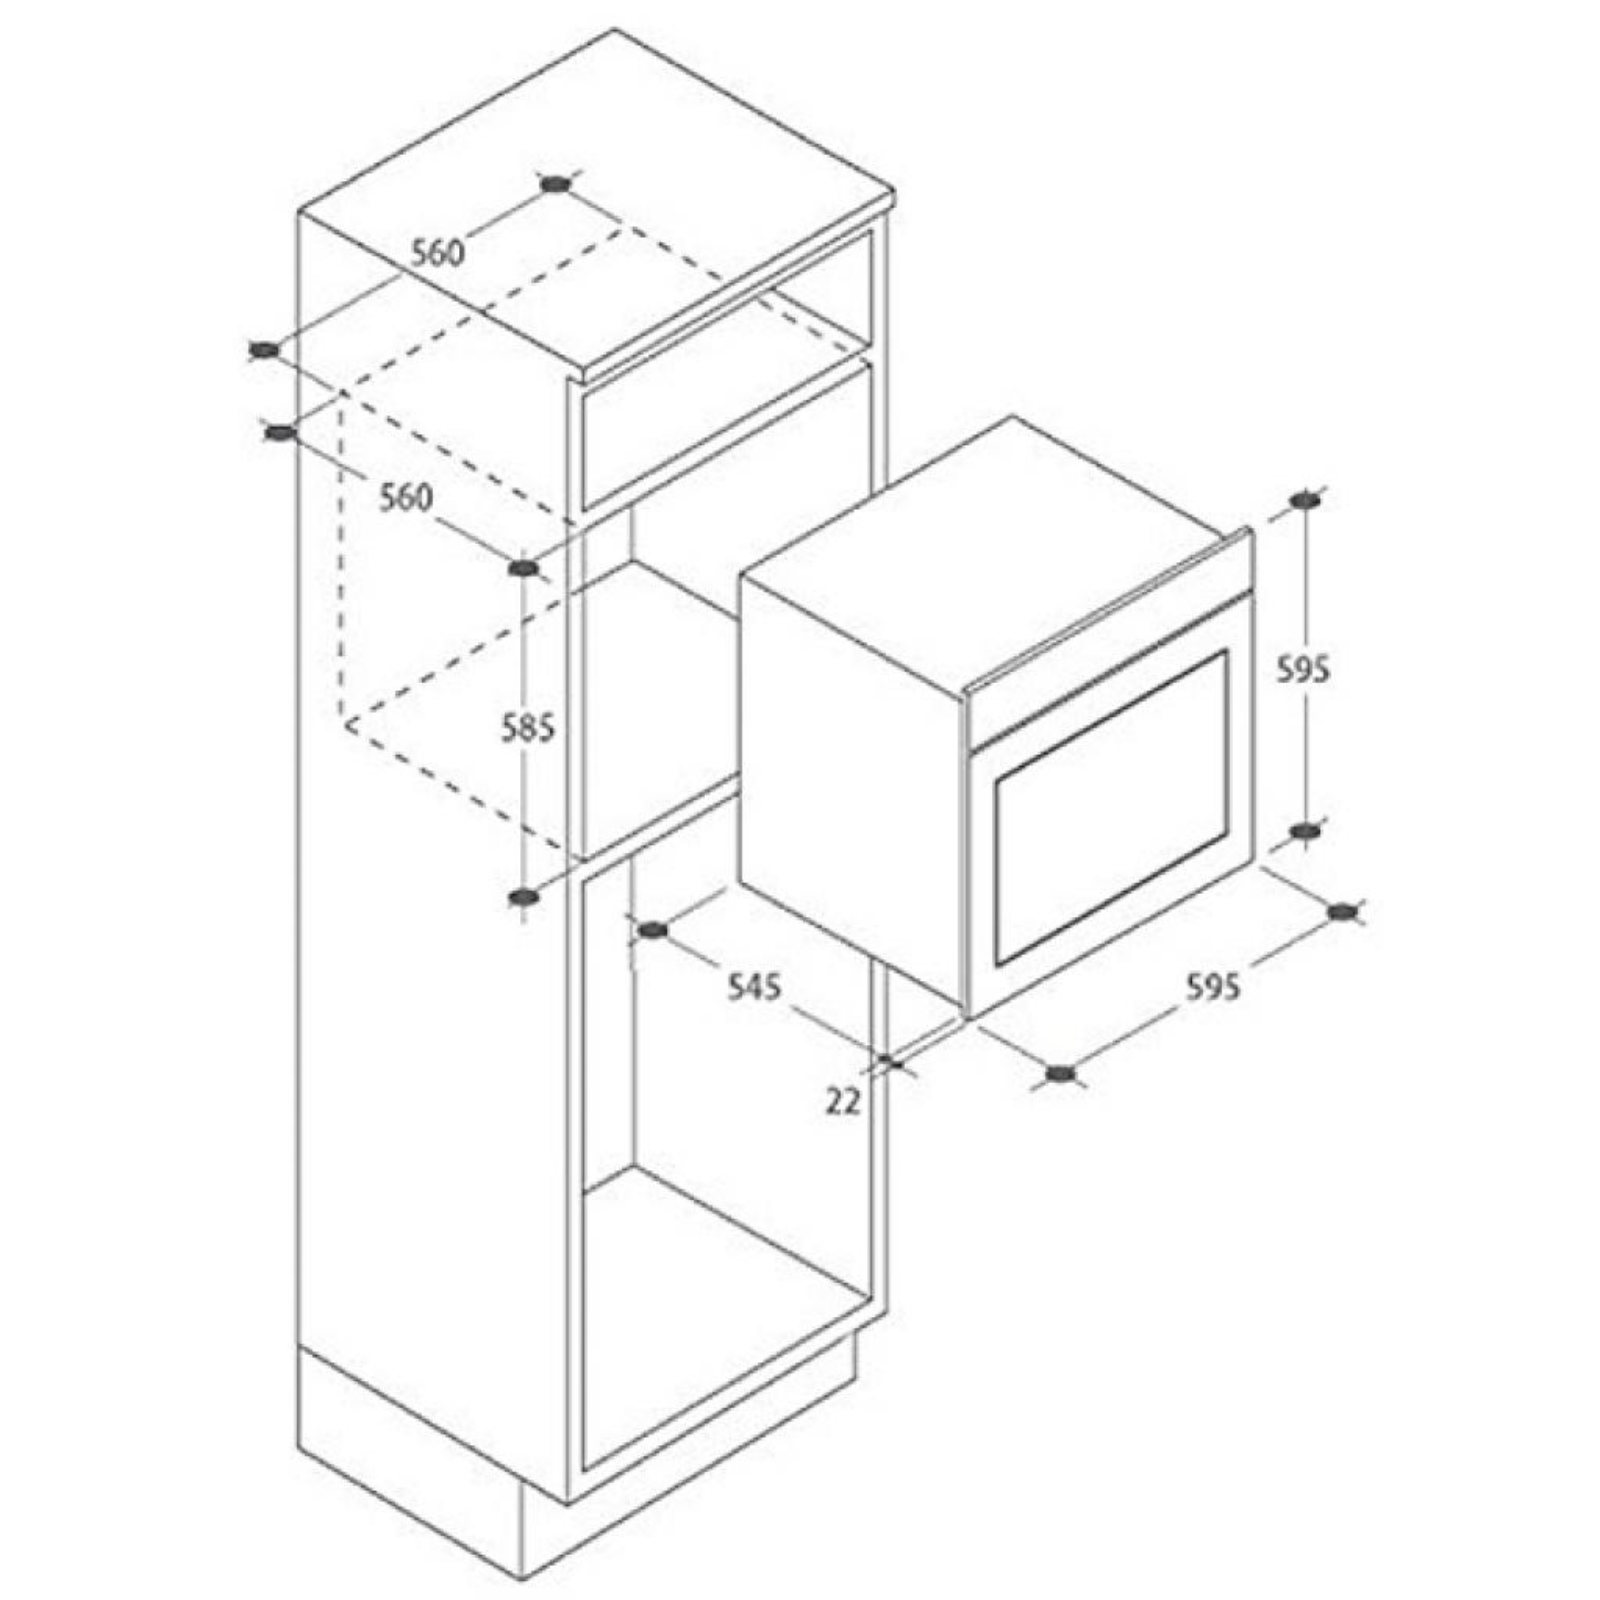 Духовой шкаф CANDY FPE 602A/6W (FPE602A/6W) изображение 2